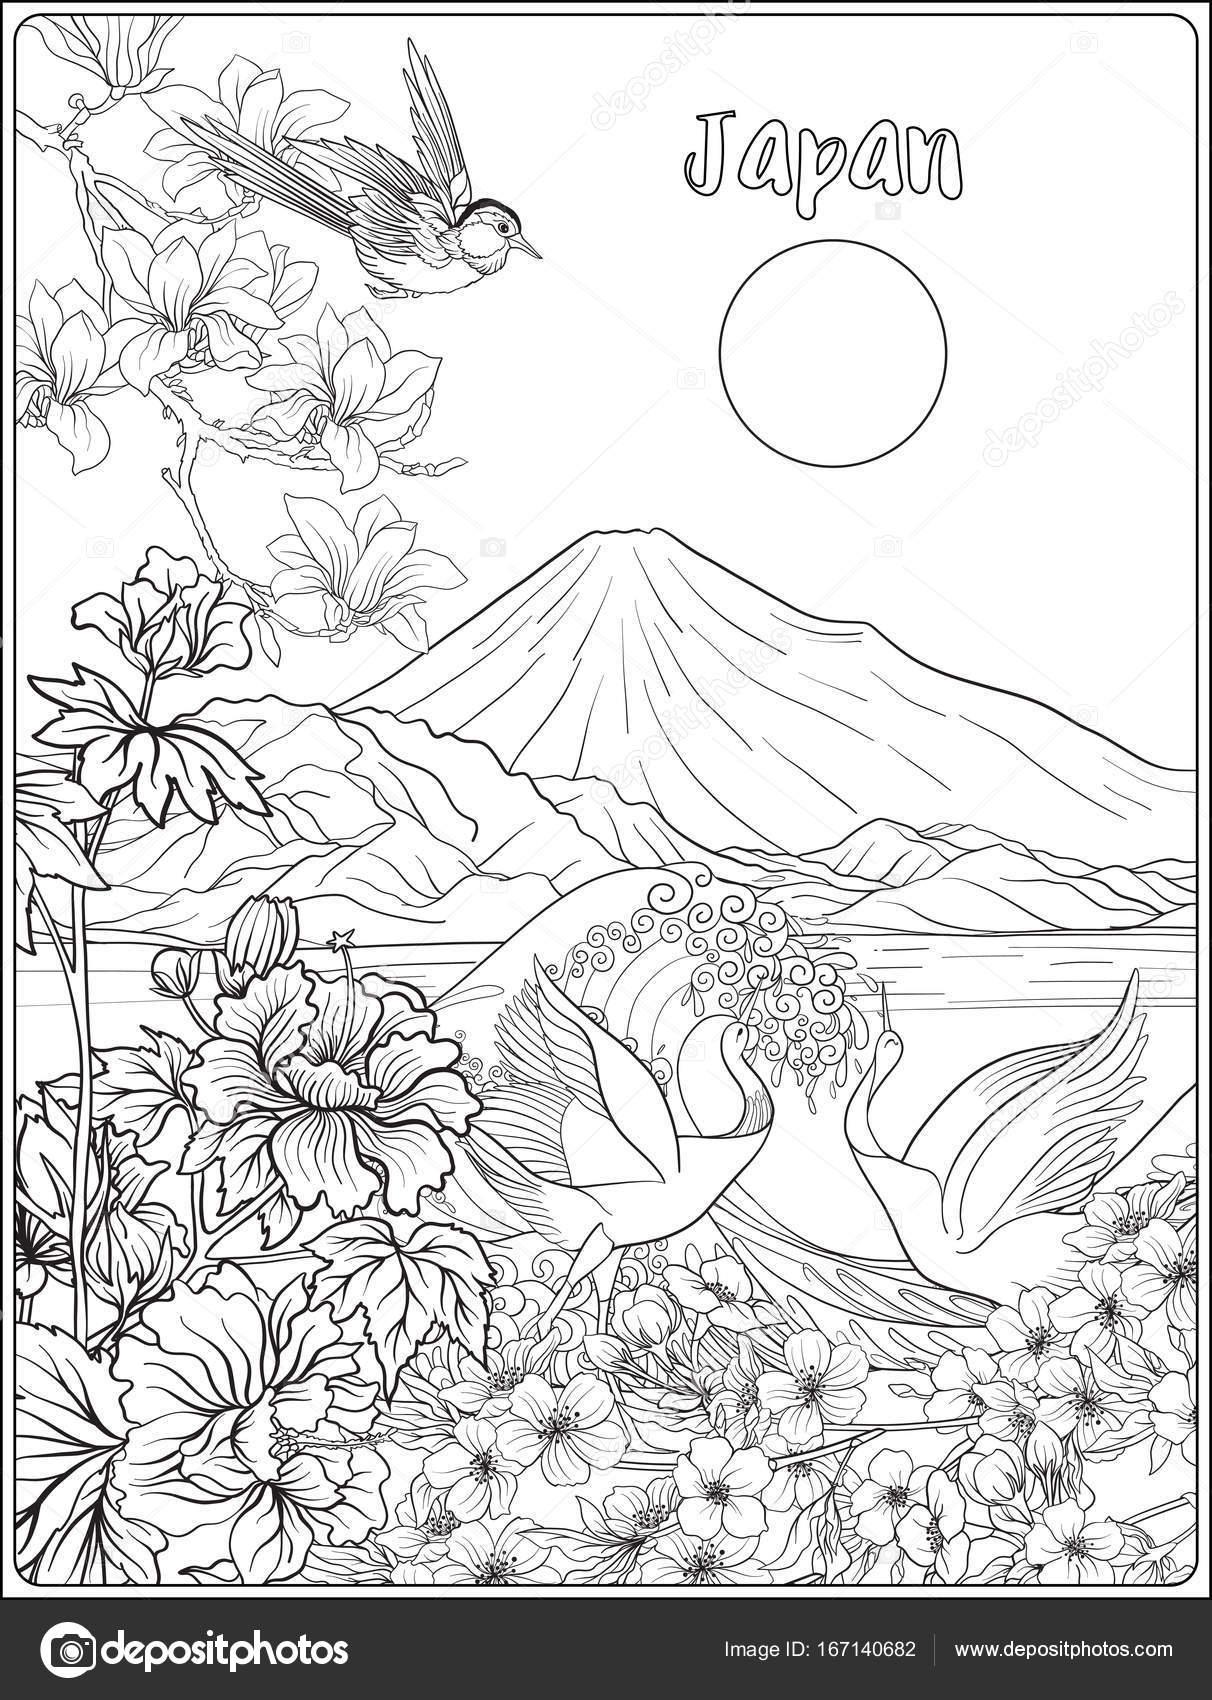 Dibujos: flores japonesas para pintar | Paisaje japonés con kimo de ...